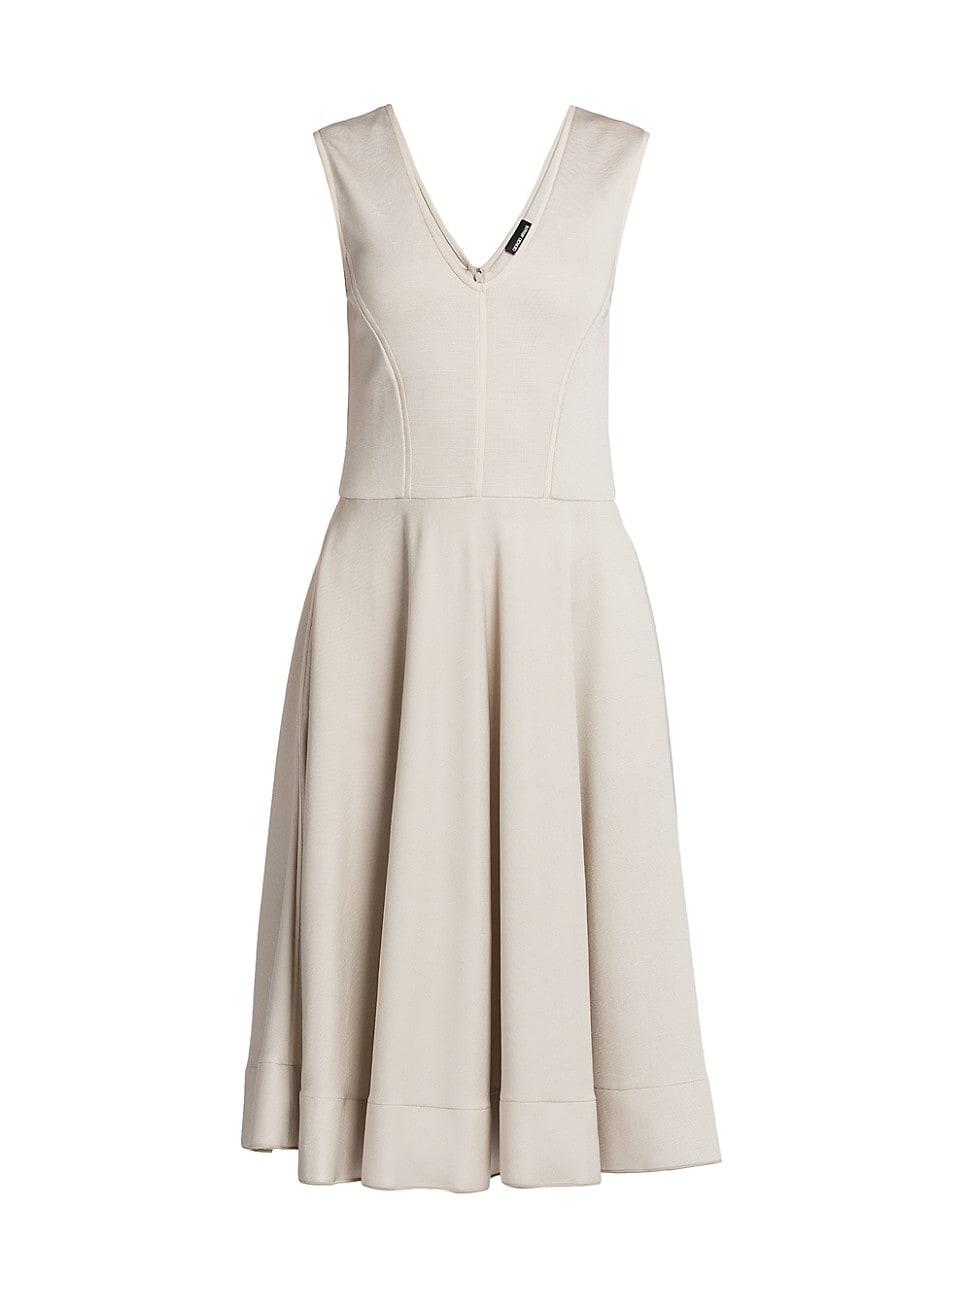 Giorgio Armani WOMEN'S SLEEVELESS OTTOMAN JERSEY DRESS